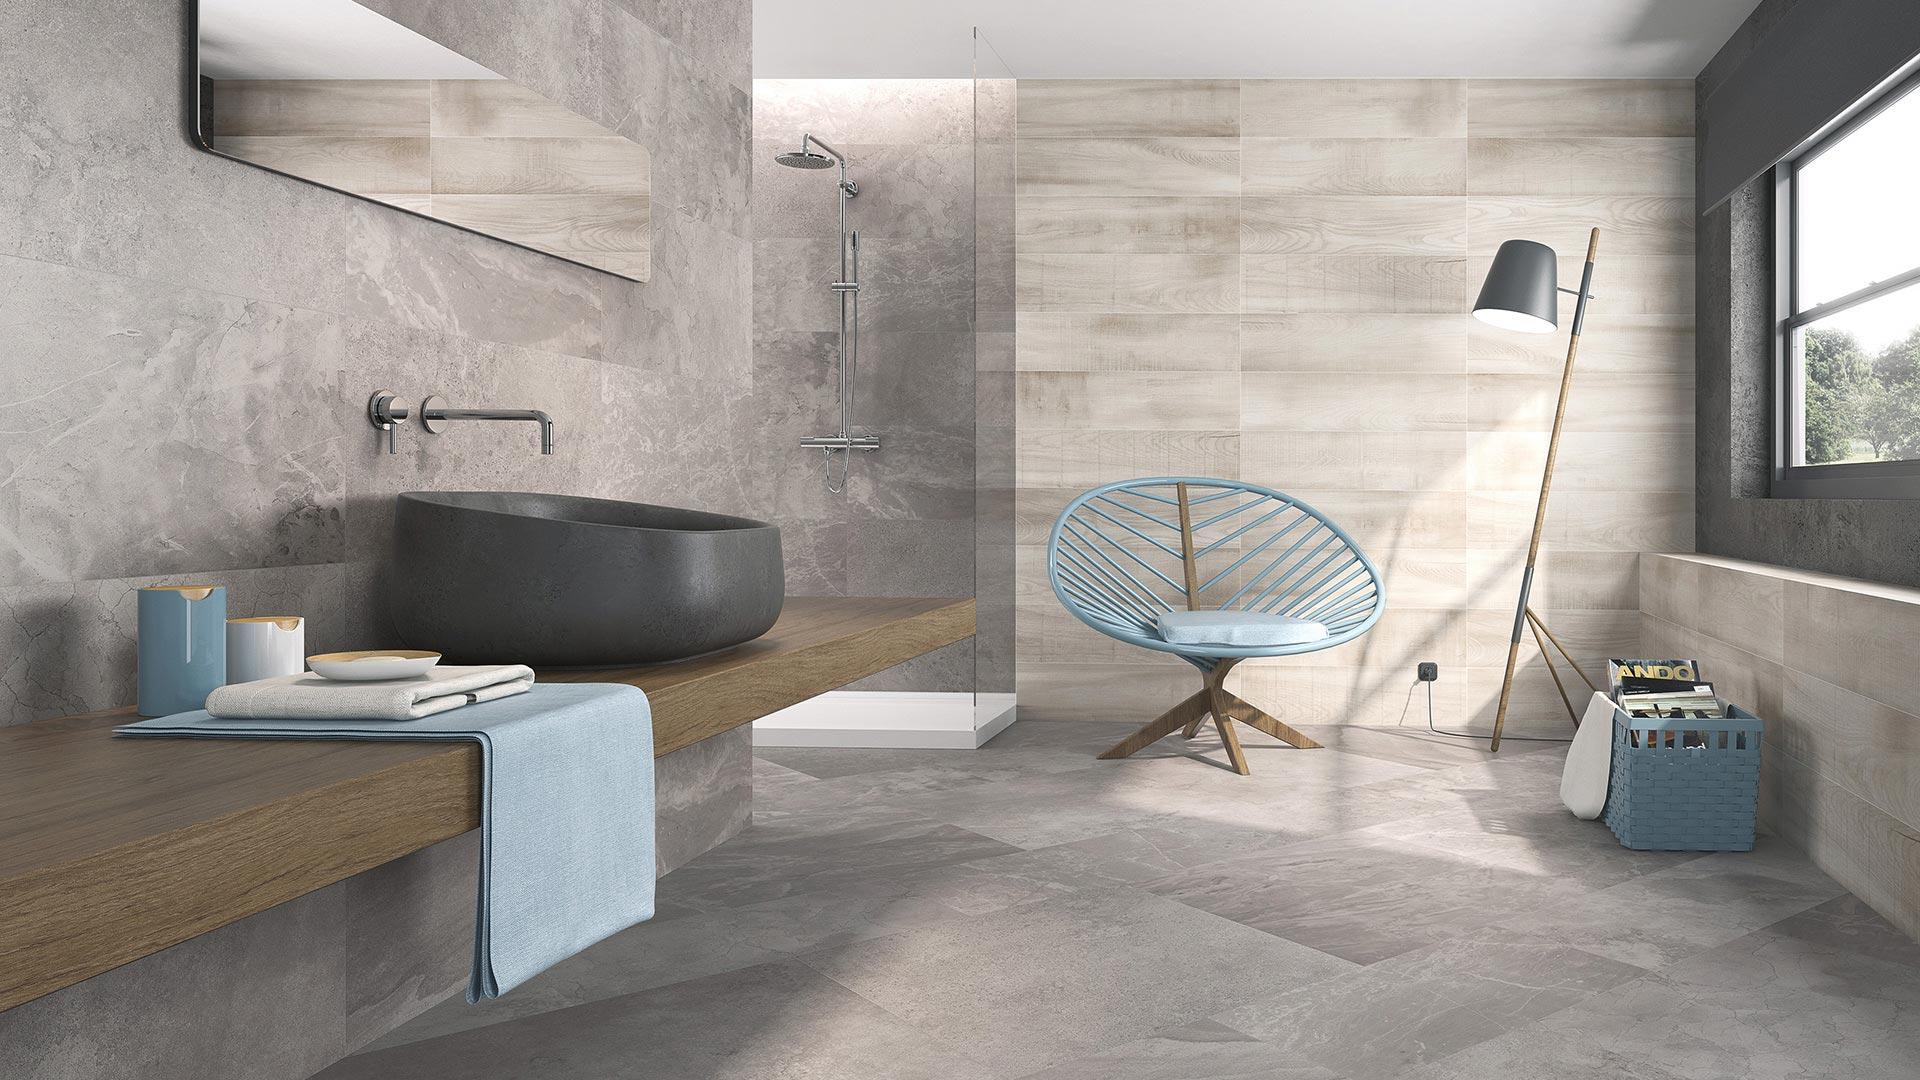 Awesome Pitre Bathrooms Bathrooms Malta Tiles Malta Home Interior And Landscaping Oversignezvosmurscom